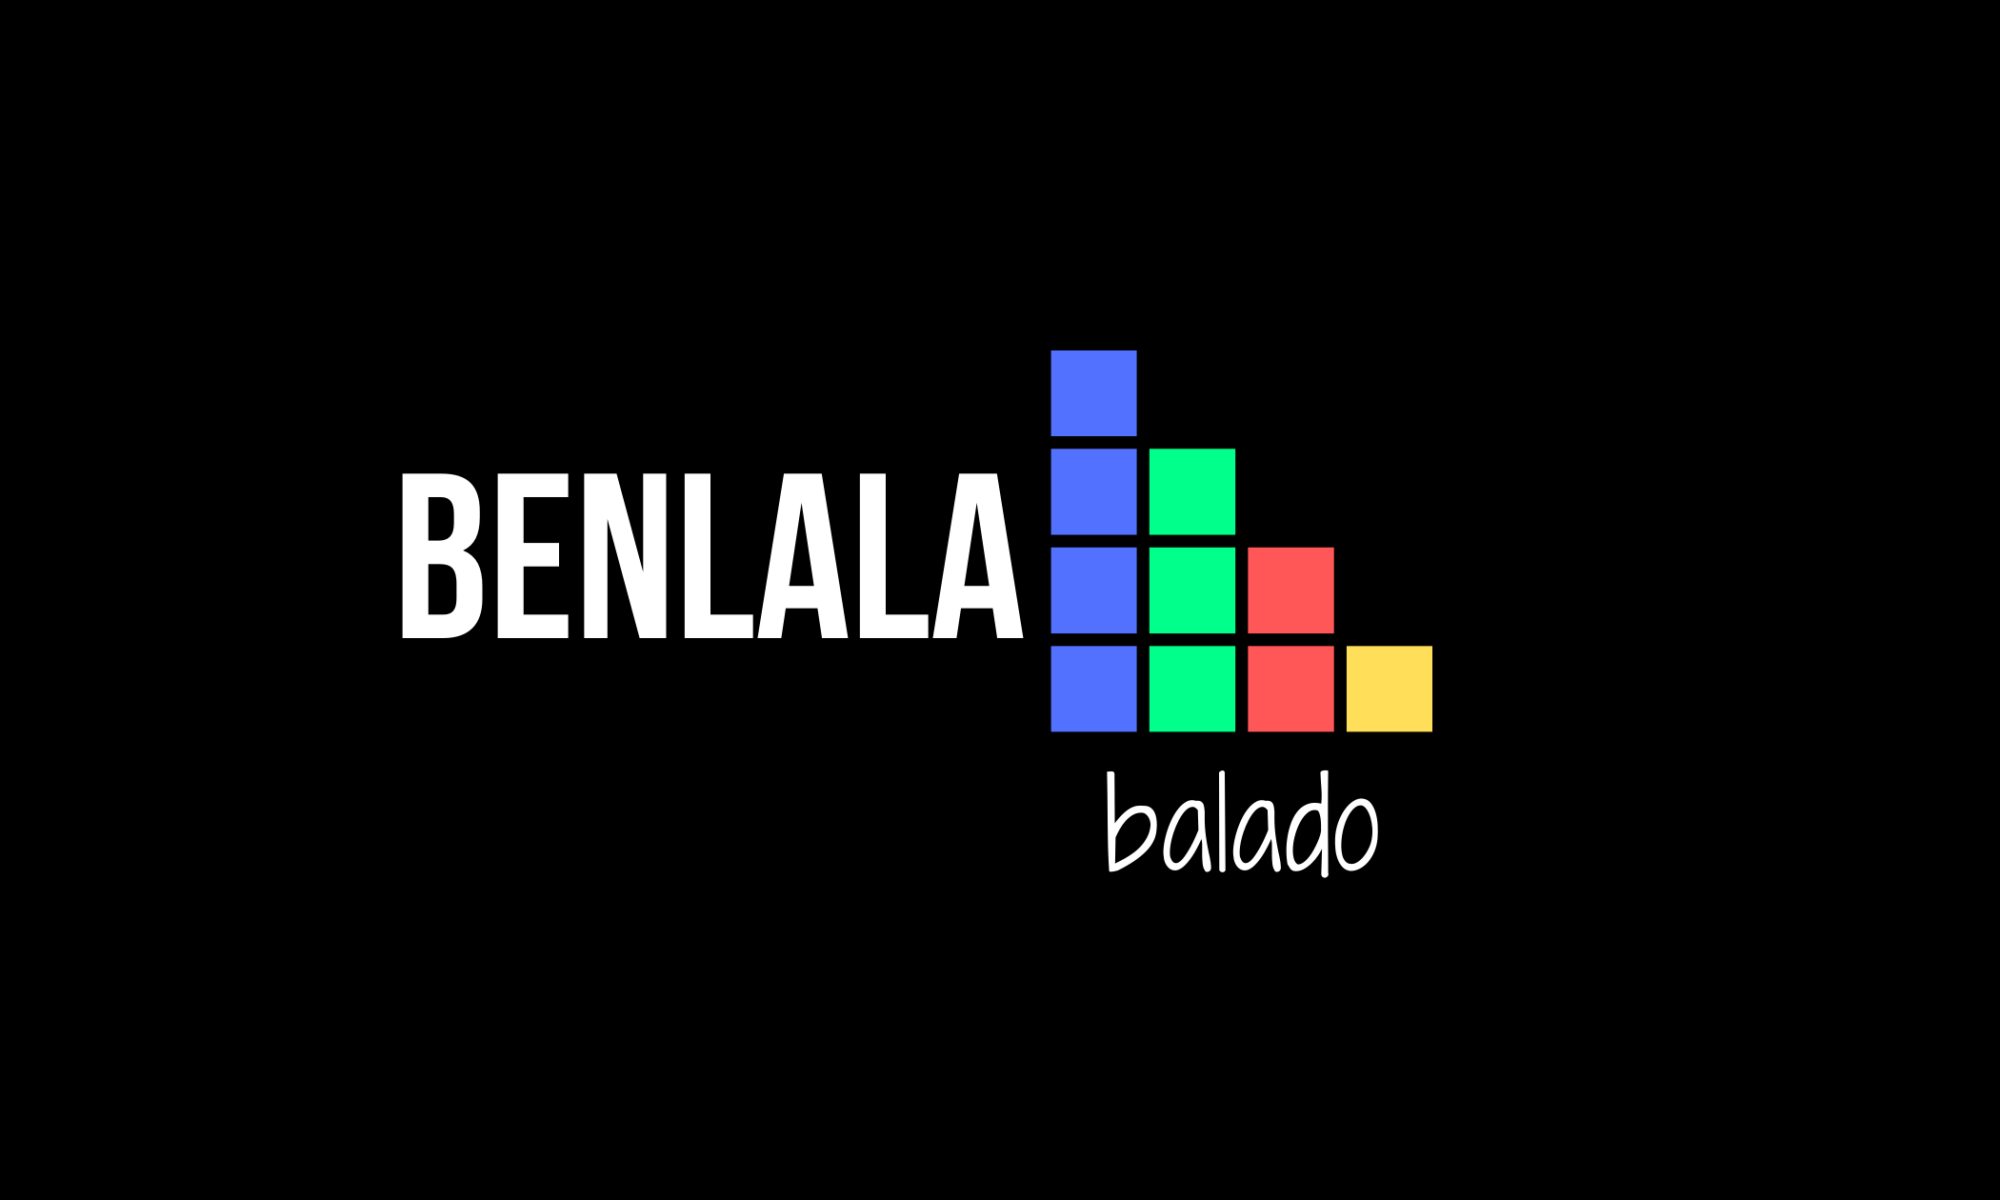 benlala